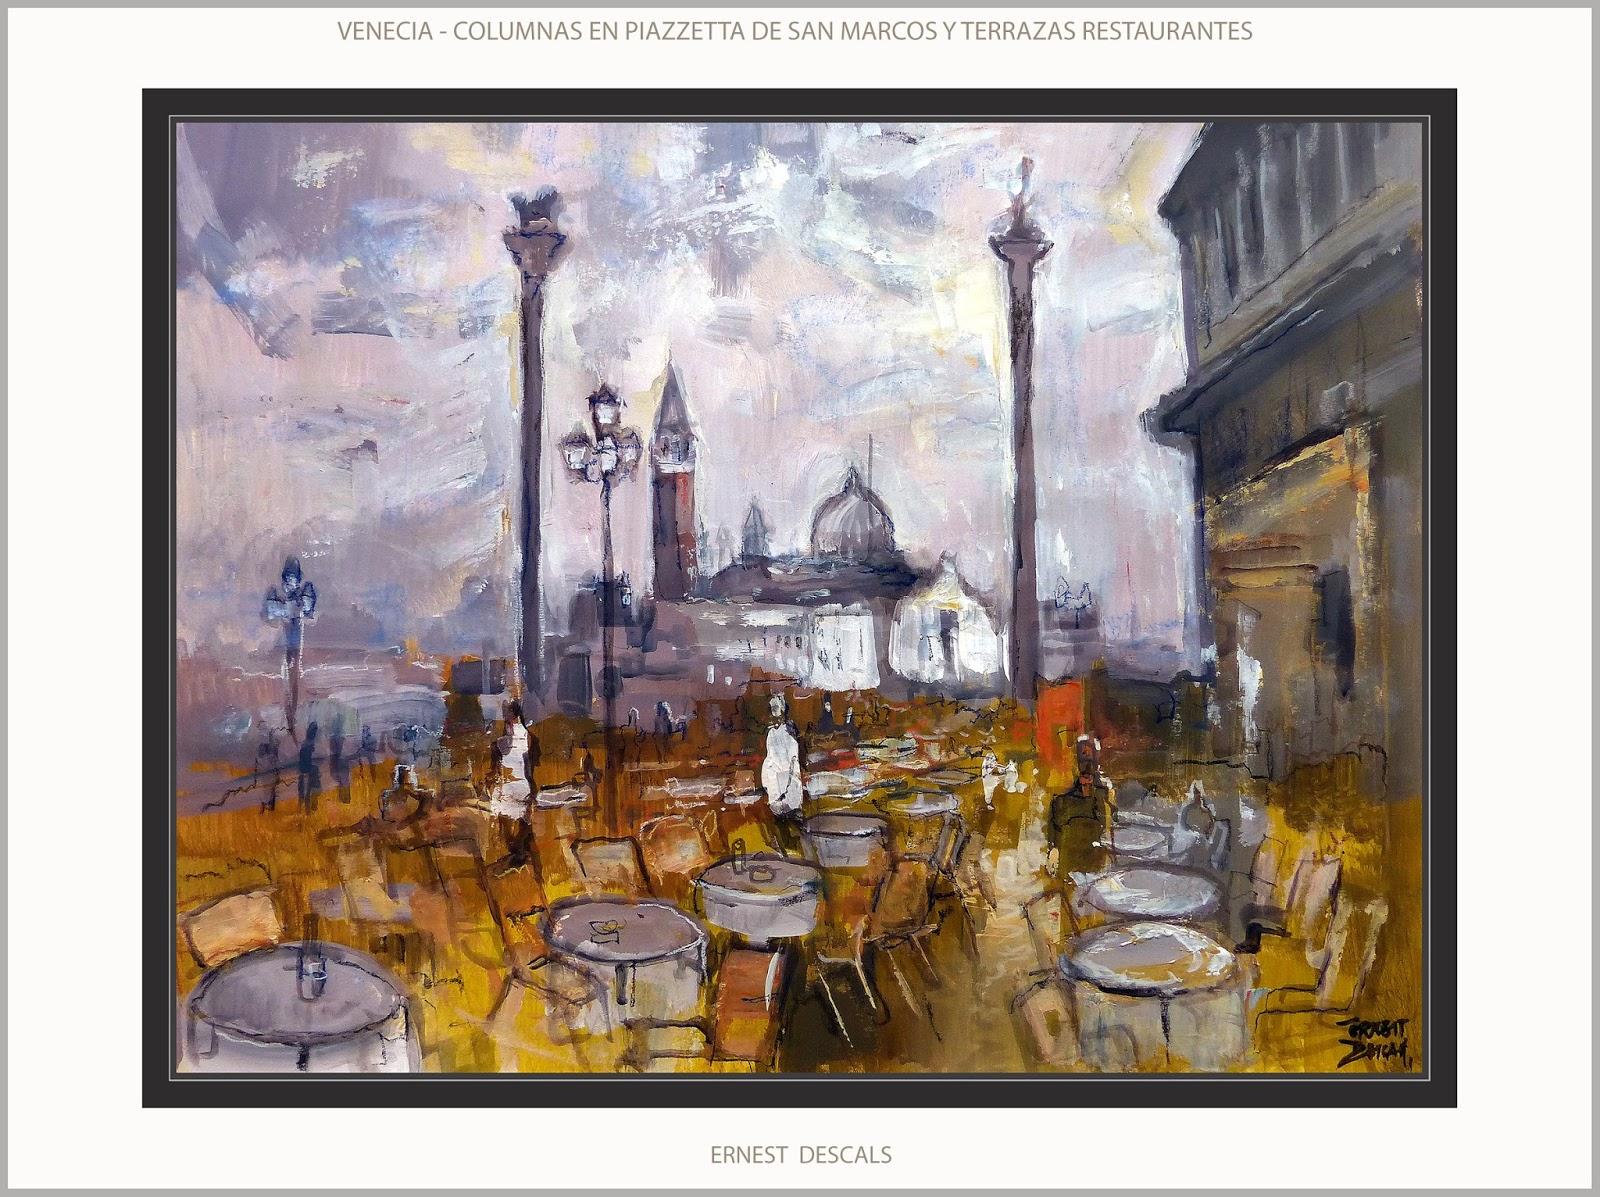 Ernest Descals.Artista Pintor: VENECIA-PINTURA-PAISAJES-RESTAURANTES ...